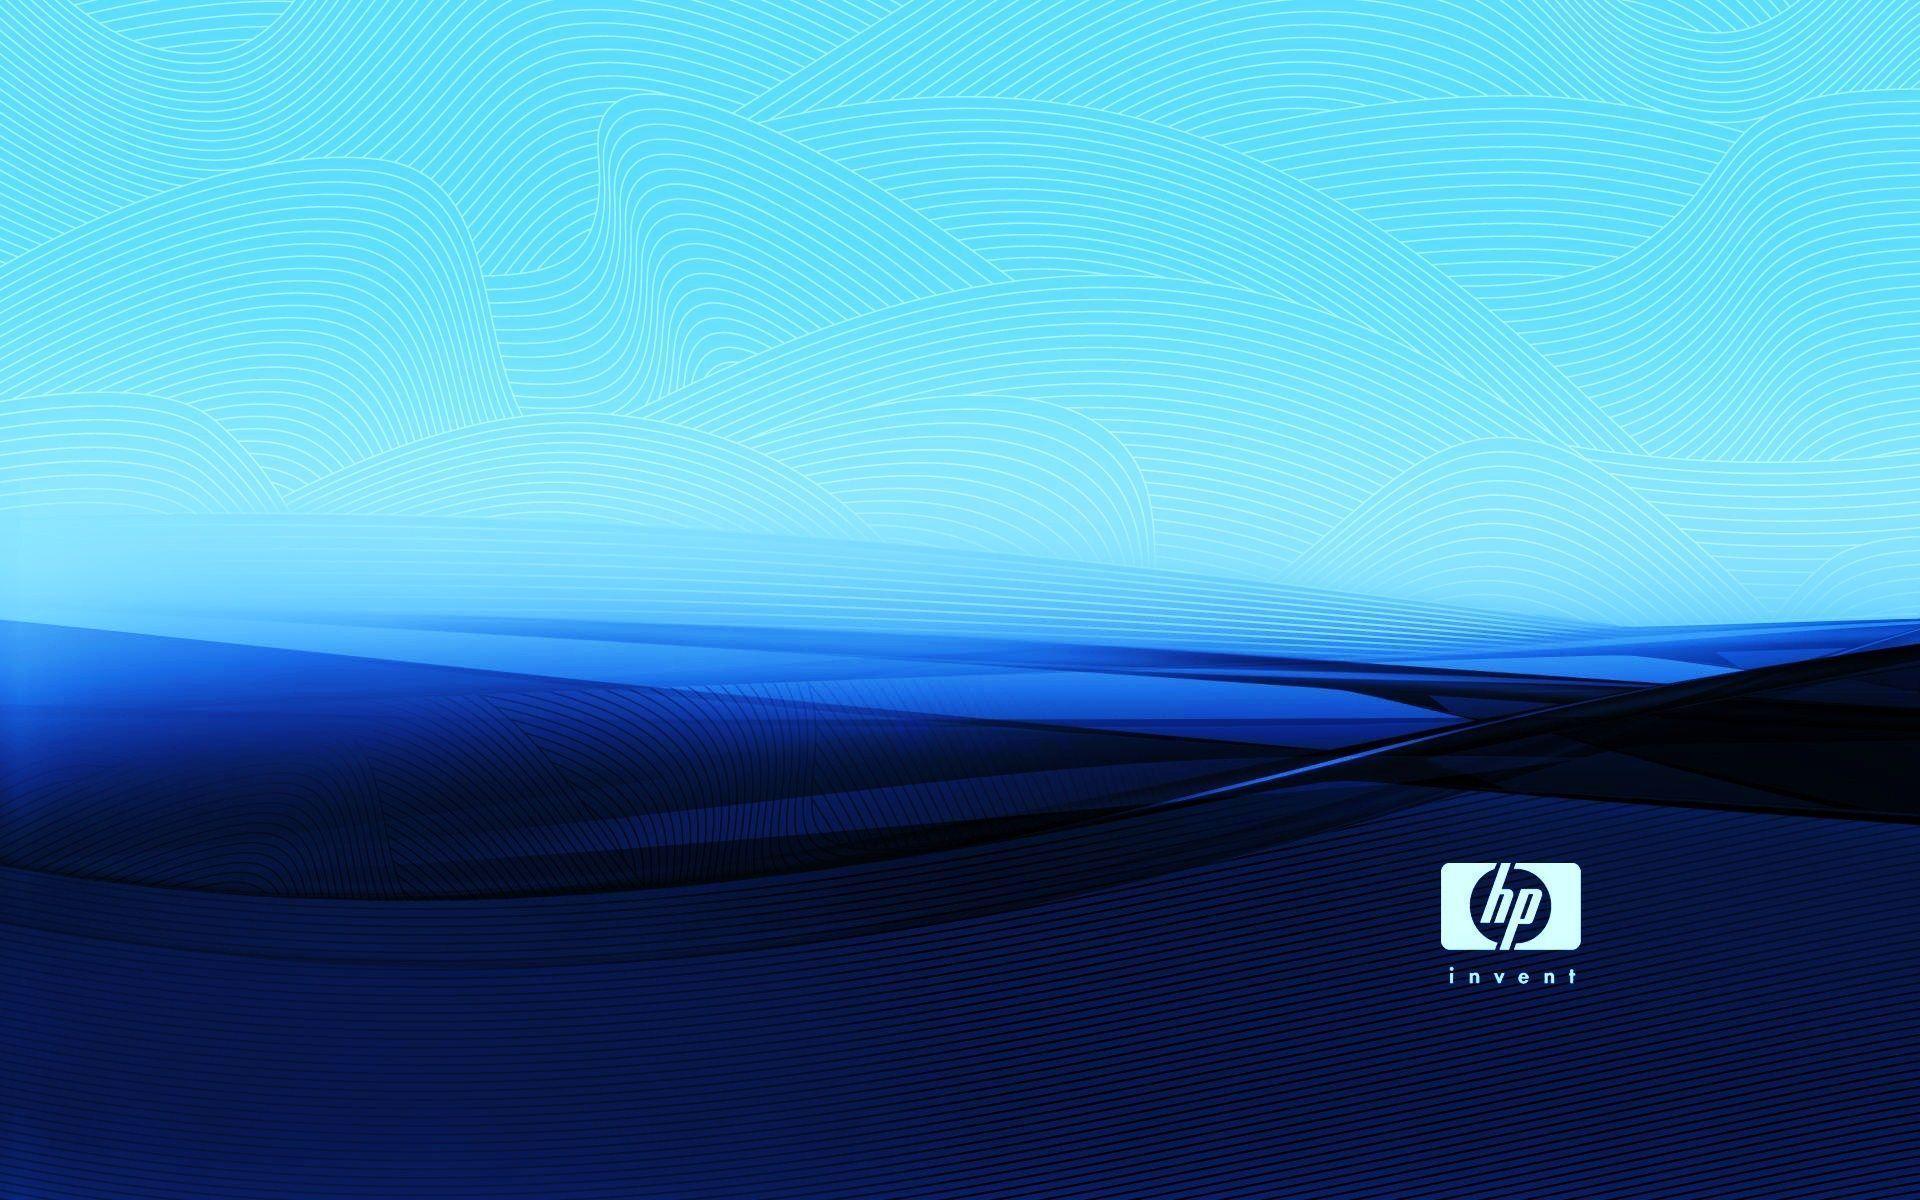 Hp Wallpaper 11 9170 HD Wallpaper | Wallroro.